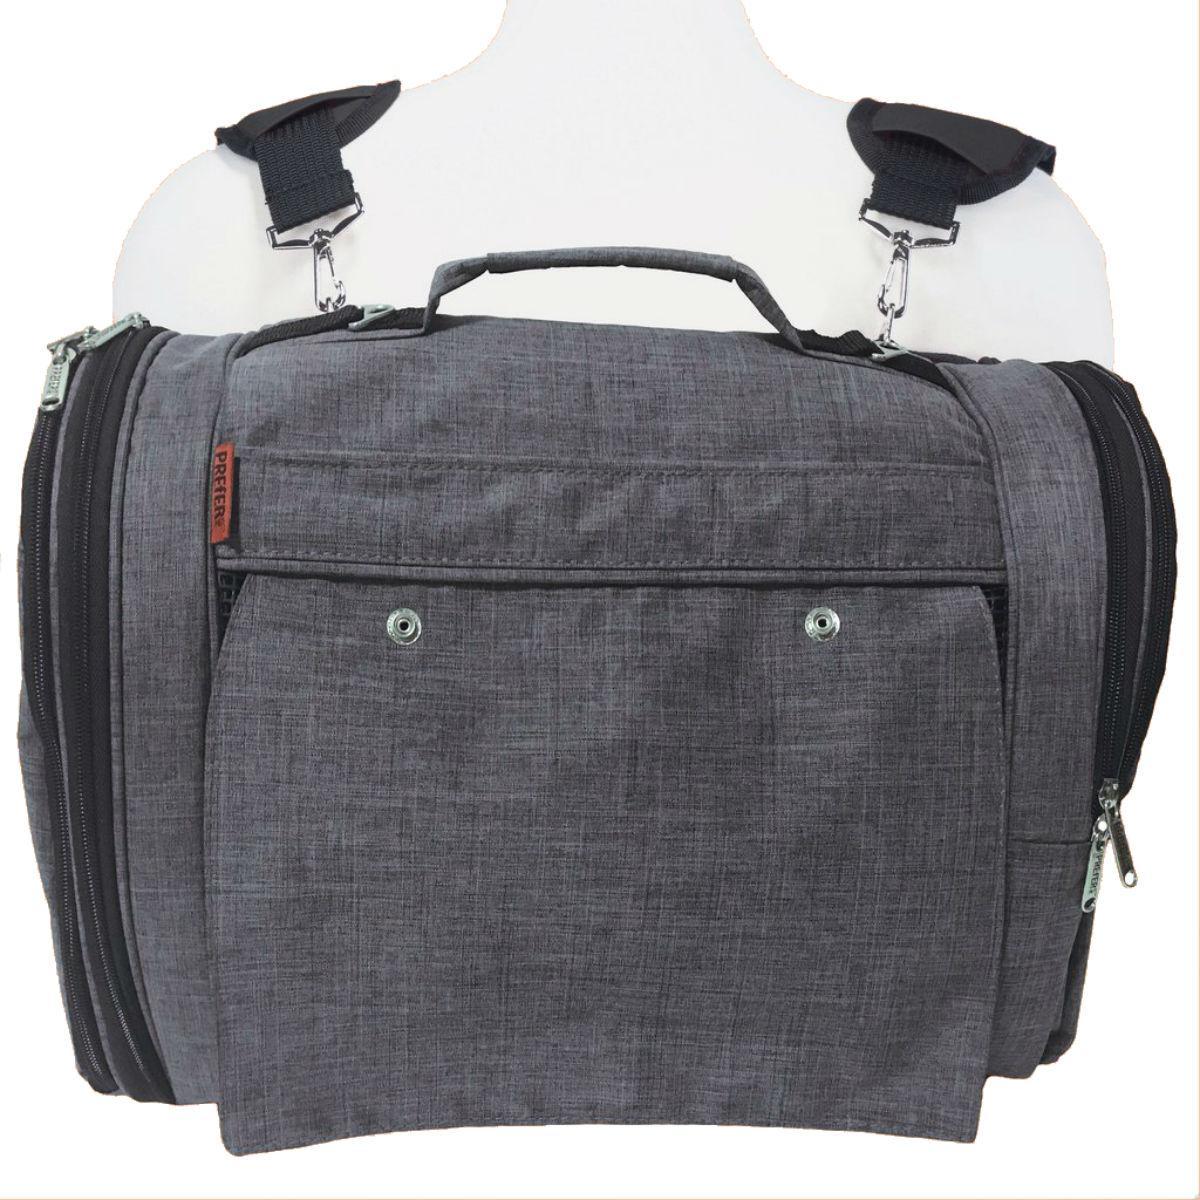 Prefer Pets Hideaway Backpack Pet Carrier - Heather Gray